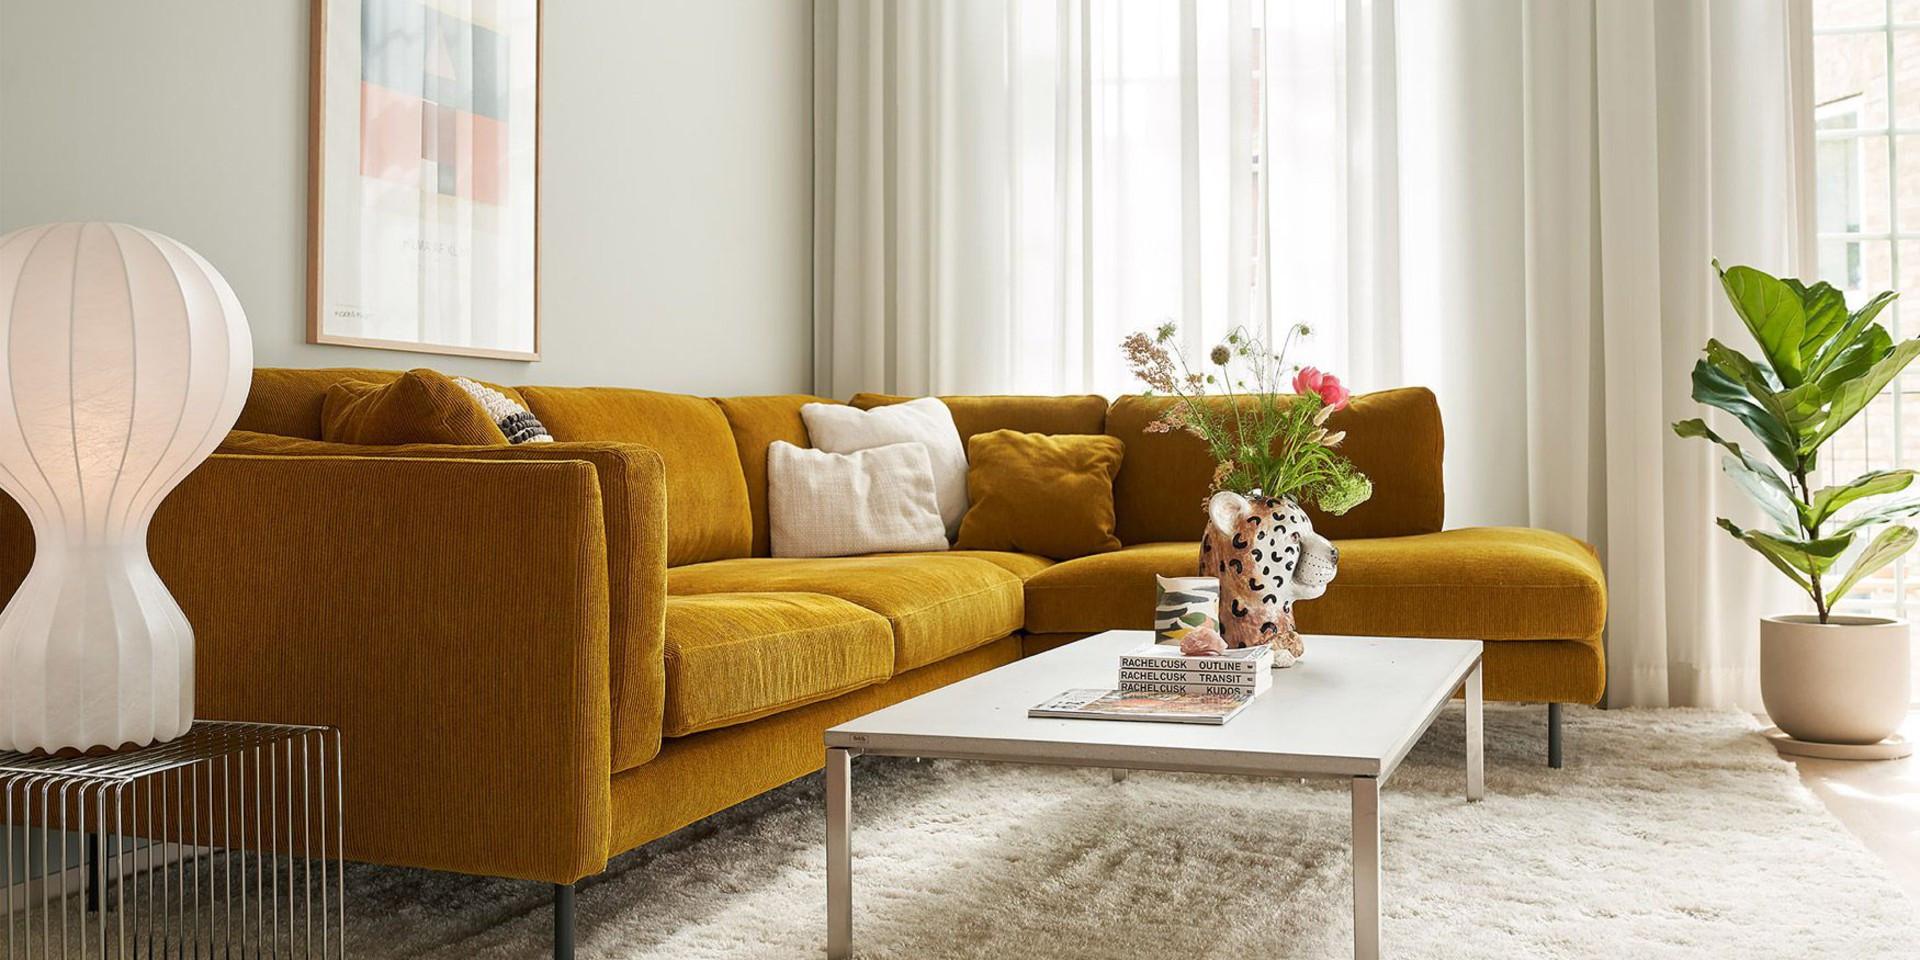 Sofa Sigge firmy Sits. Projekt: Steven Schilte. Fot. Sits